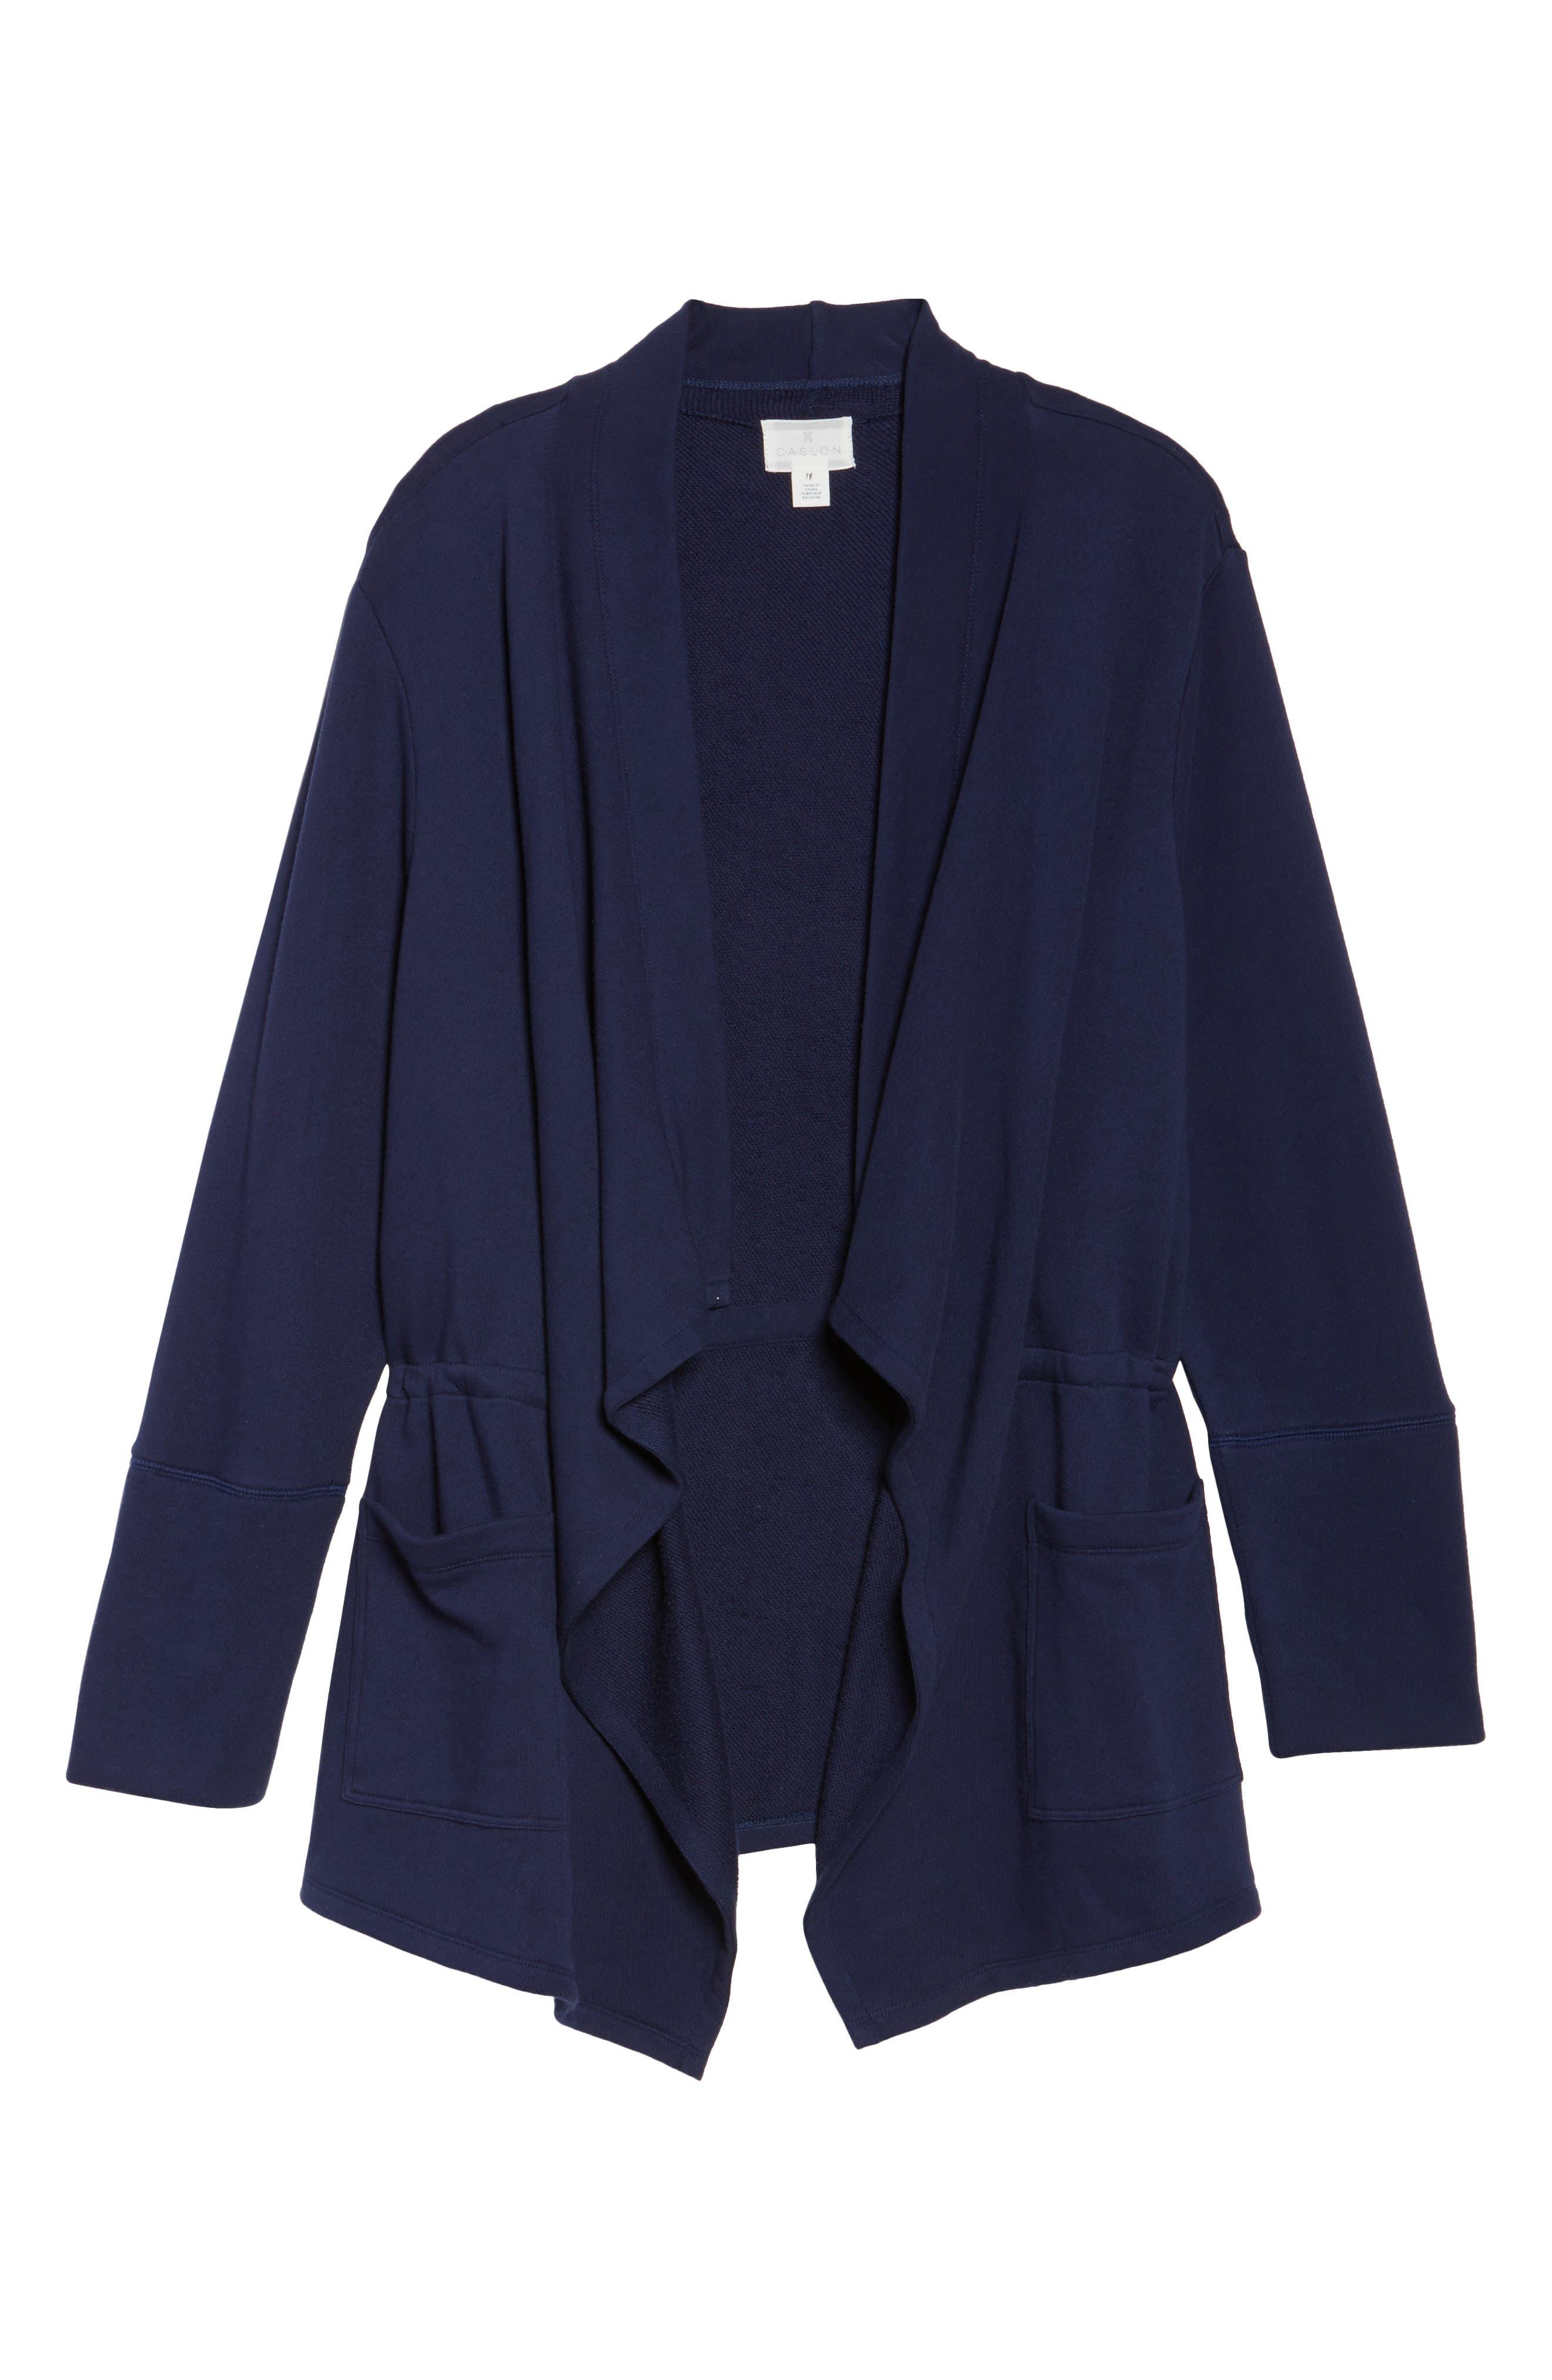 Knit Drape Front Jacket,                             Alternate thumbnail 6, color,                             Navy Peacoat